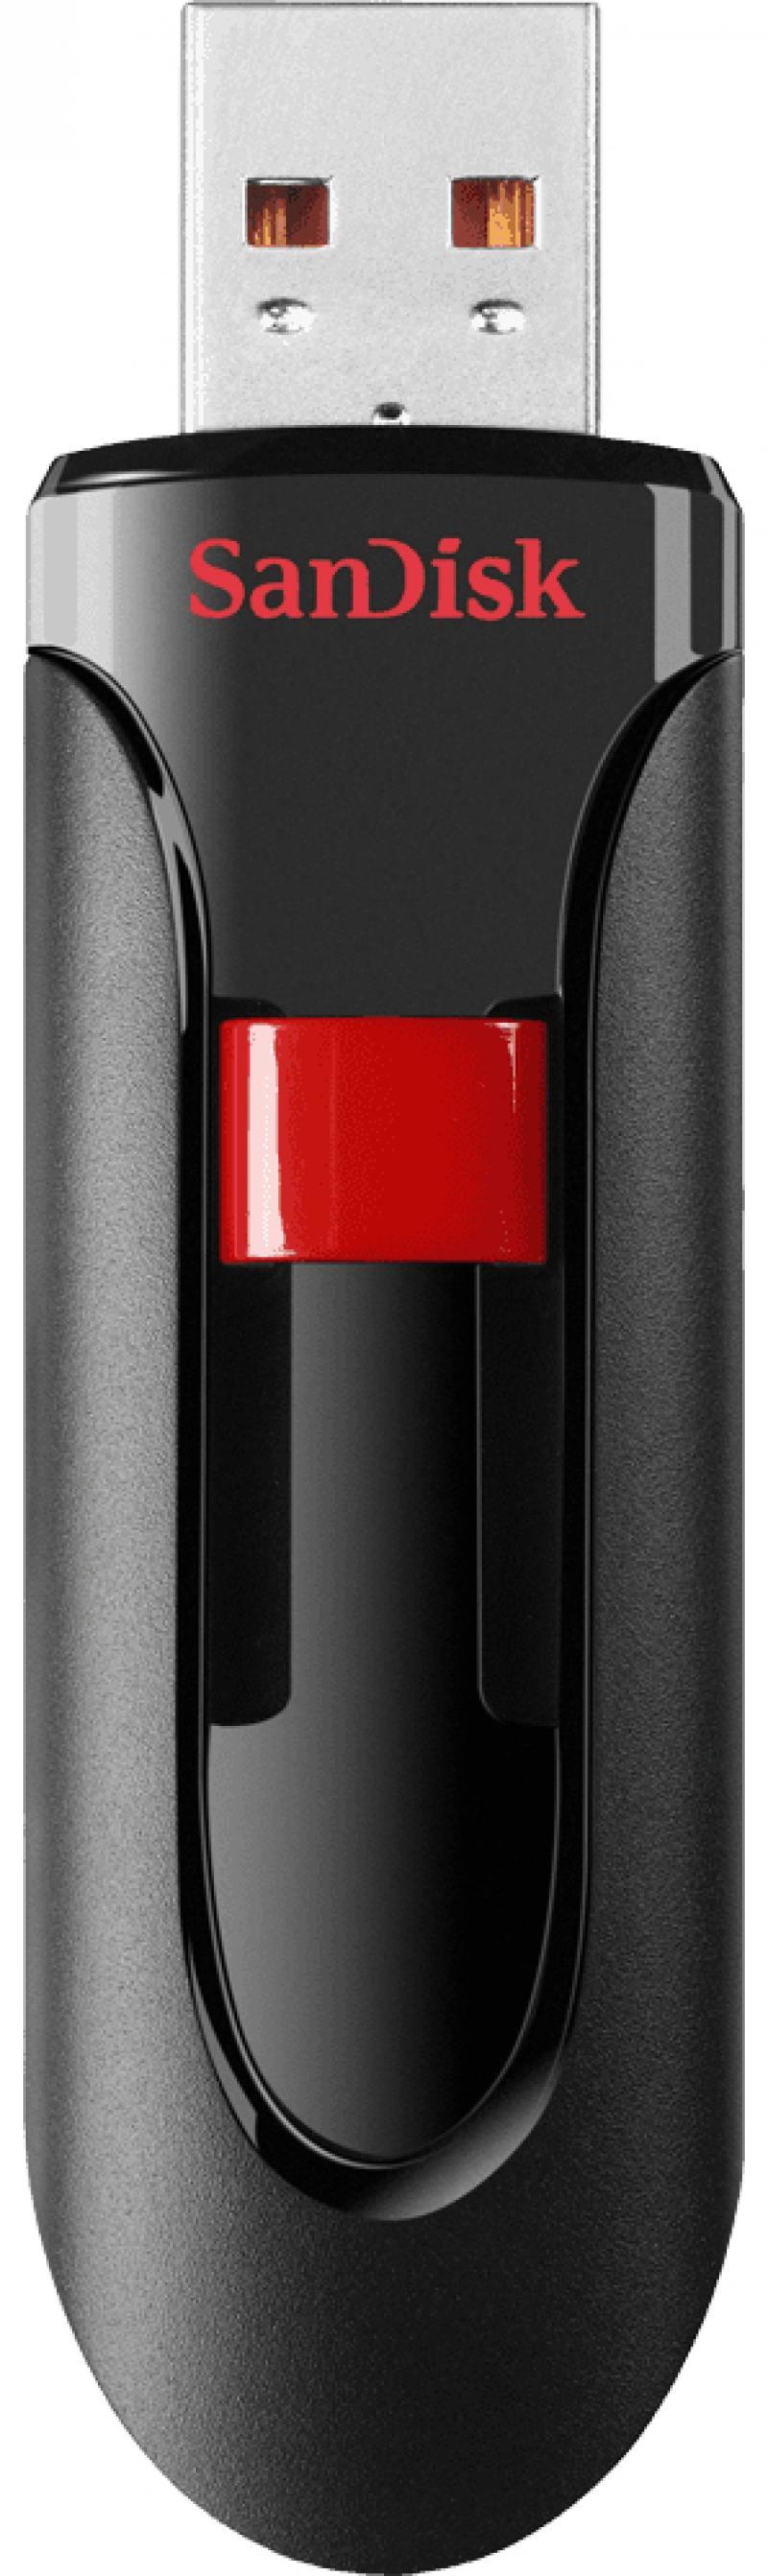 Флешка USB 256Gb Sandisk Cruzer SDCZ60-256G-B35 черный красный флешка usb sandisk cruzer edge 32гб usb2 0 красный и черный [sdcz51 032g b35]